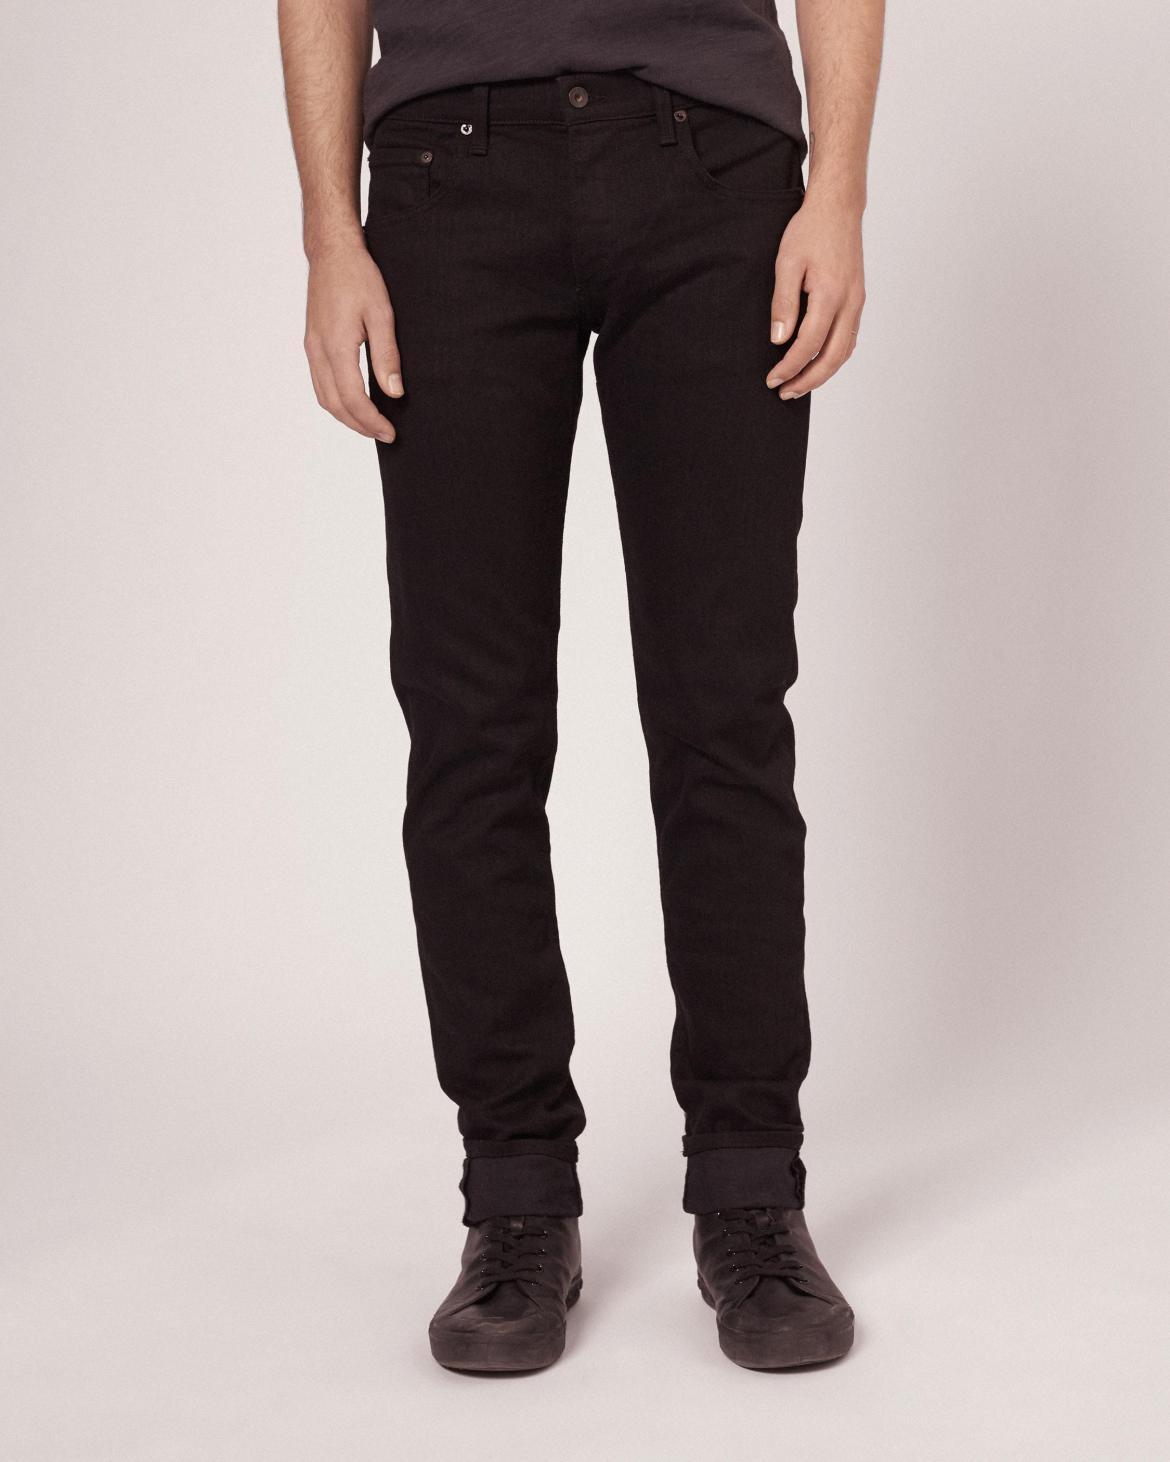 rag & bone Fit 1 black denim jeans, made in U.S.A. of Japanese fabric